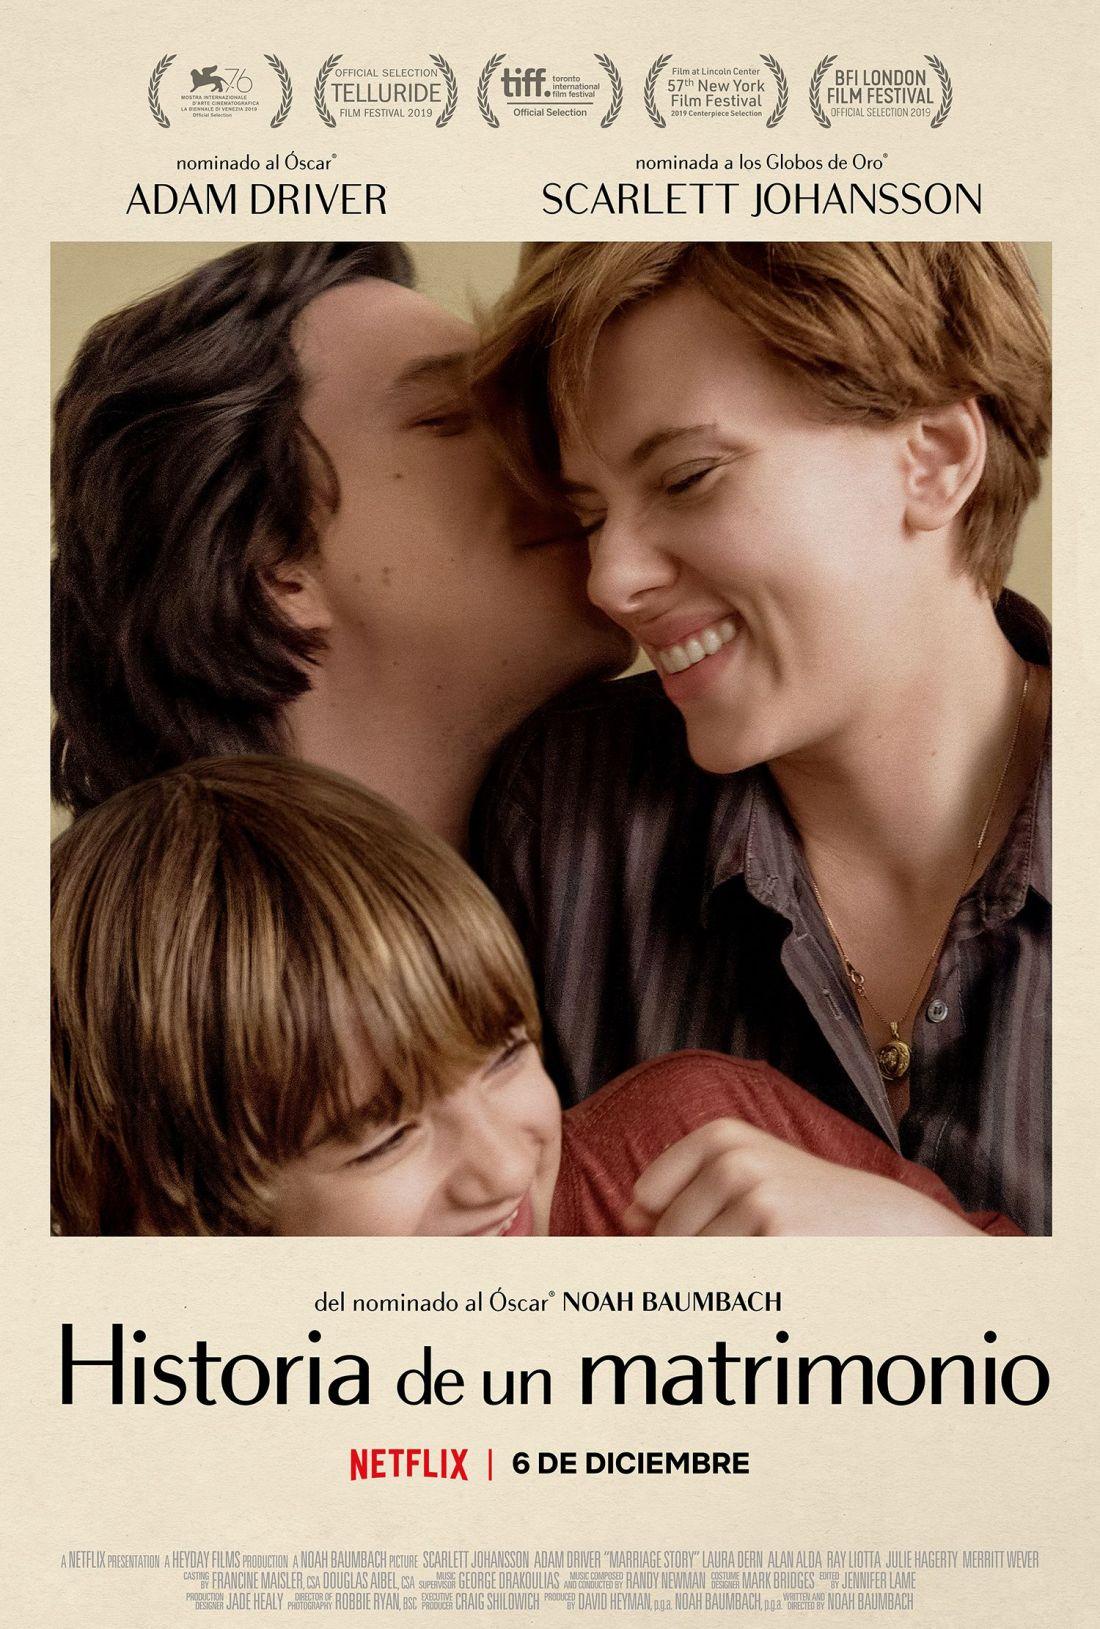 historia-de-un-matrimonio-poster